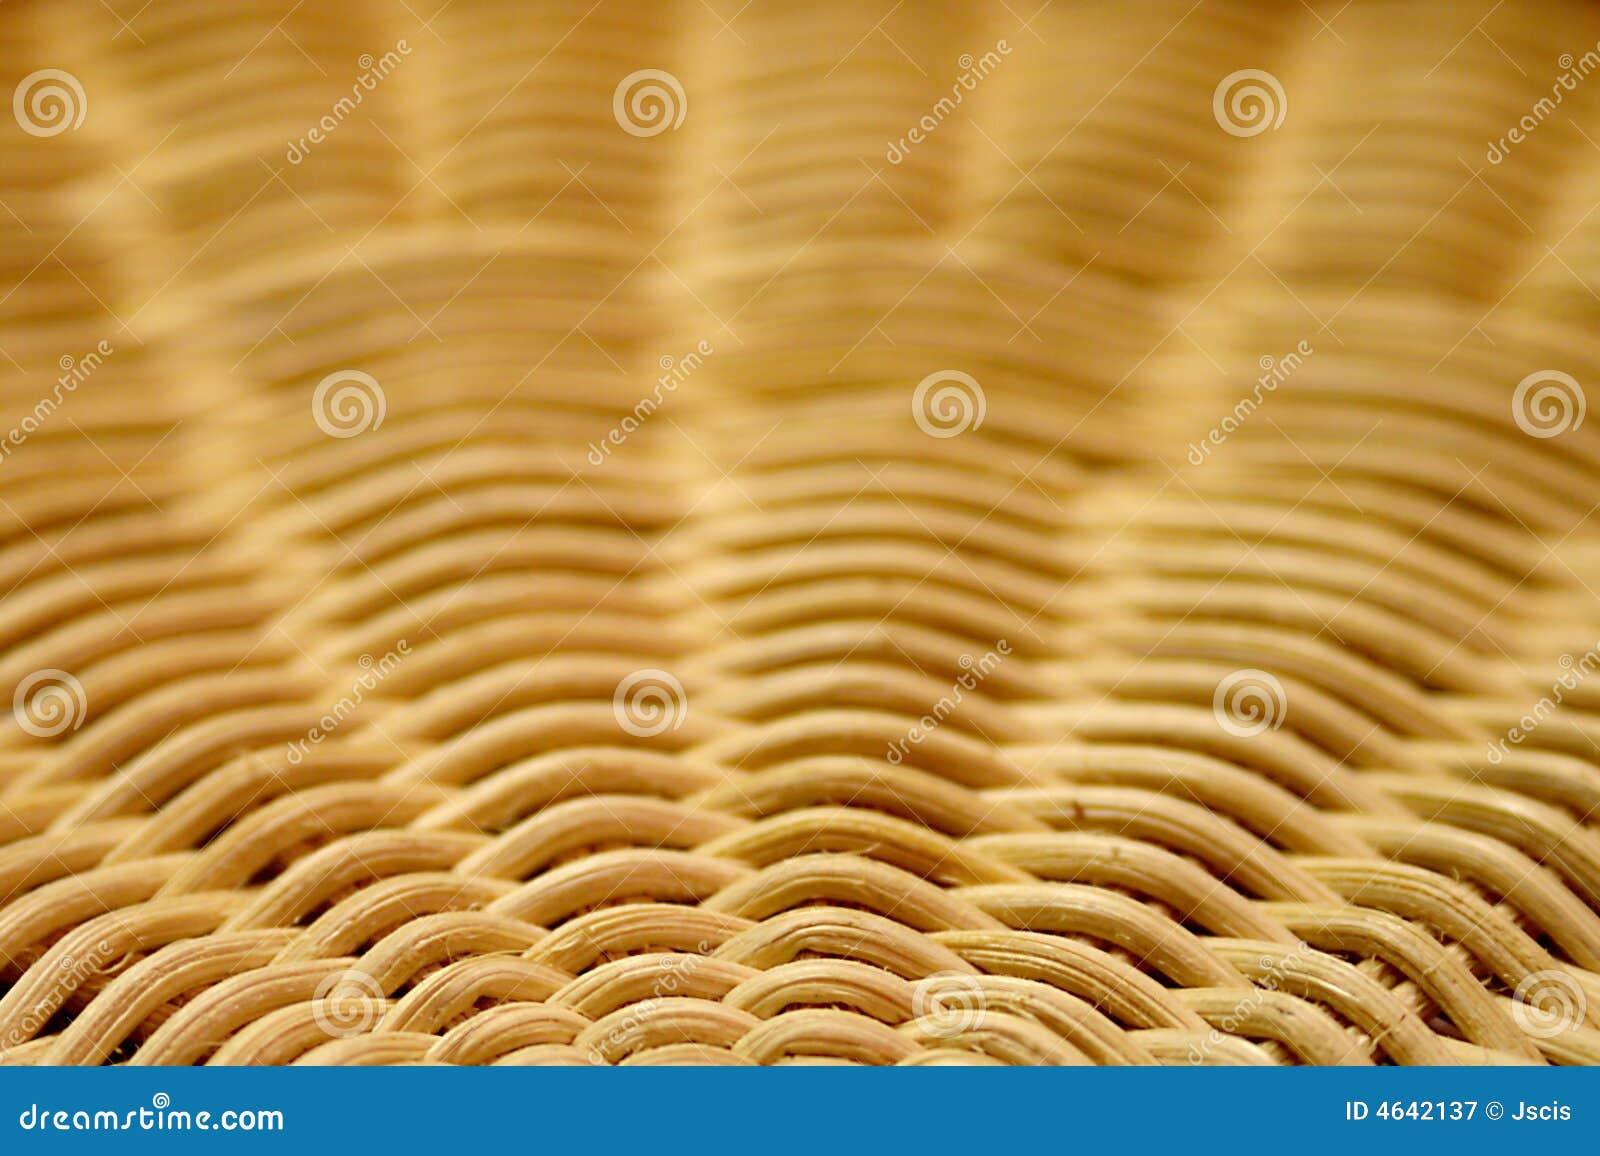 weave reed pattern - photo #13